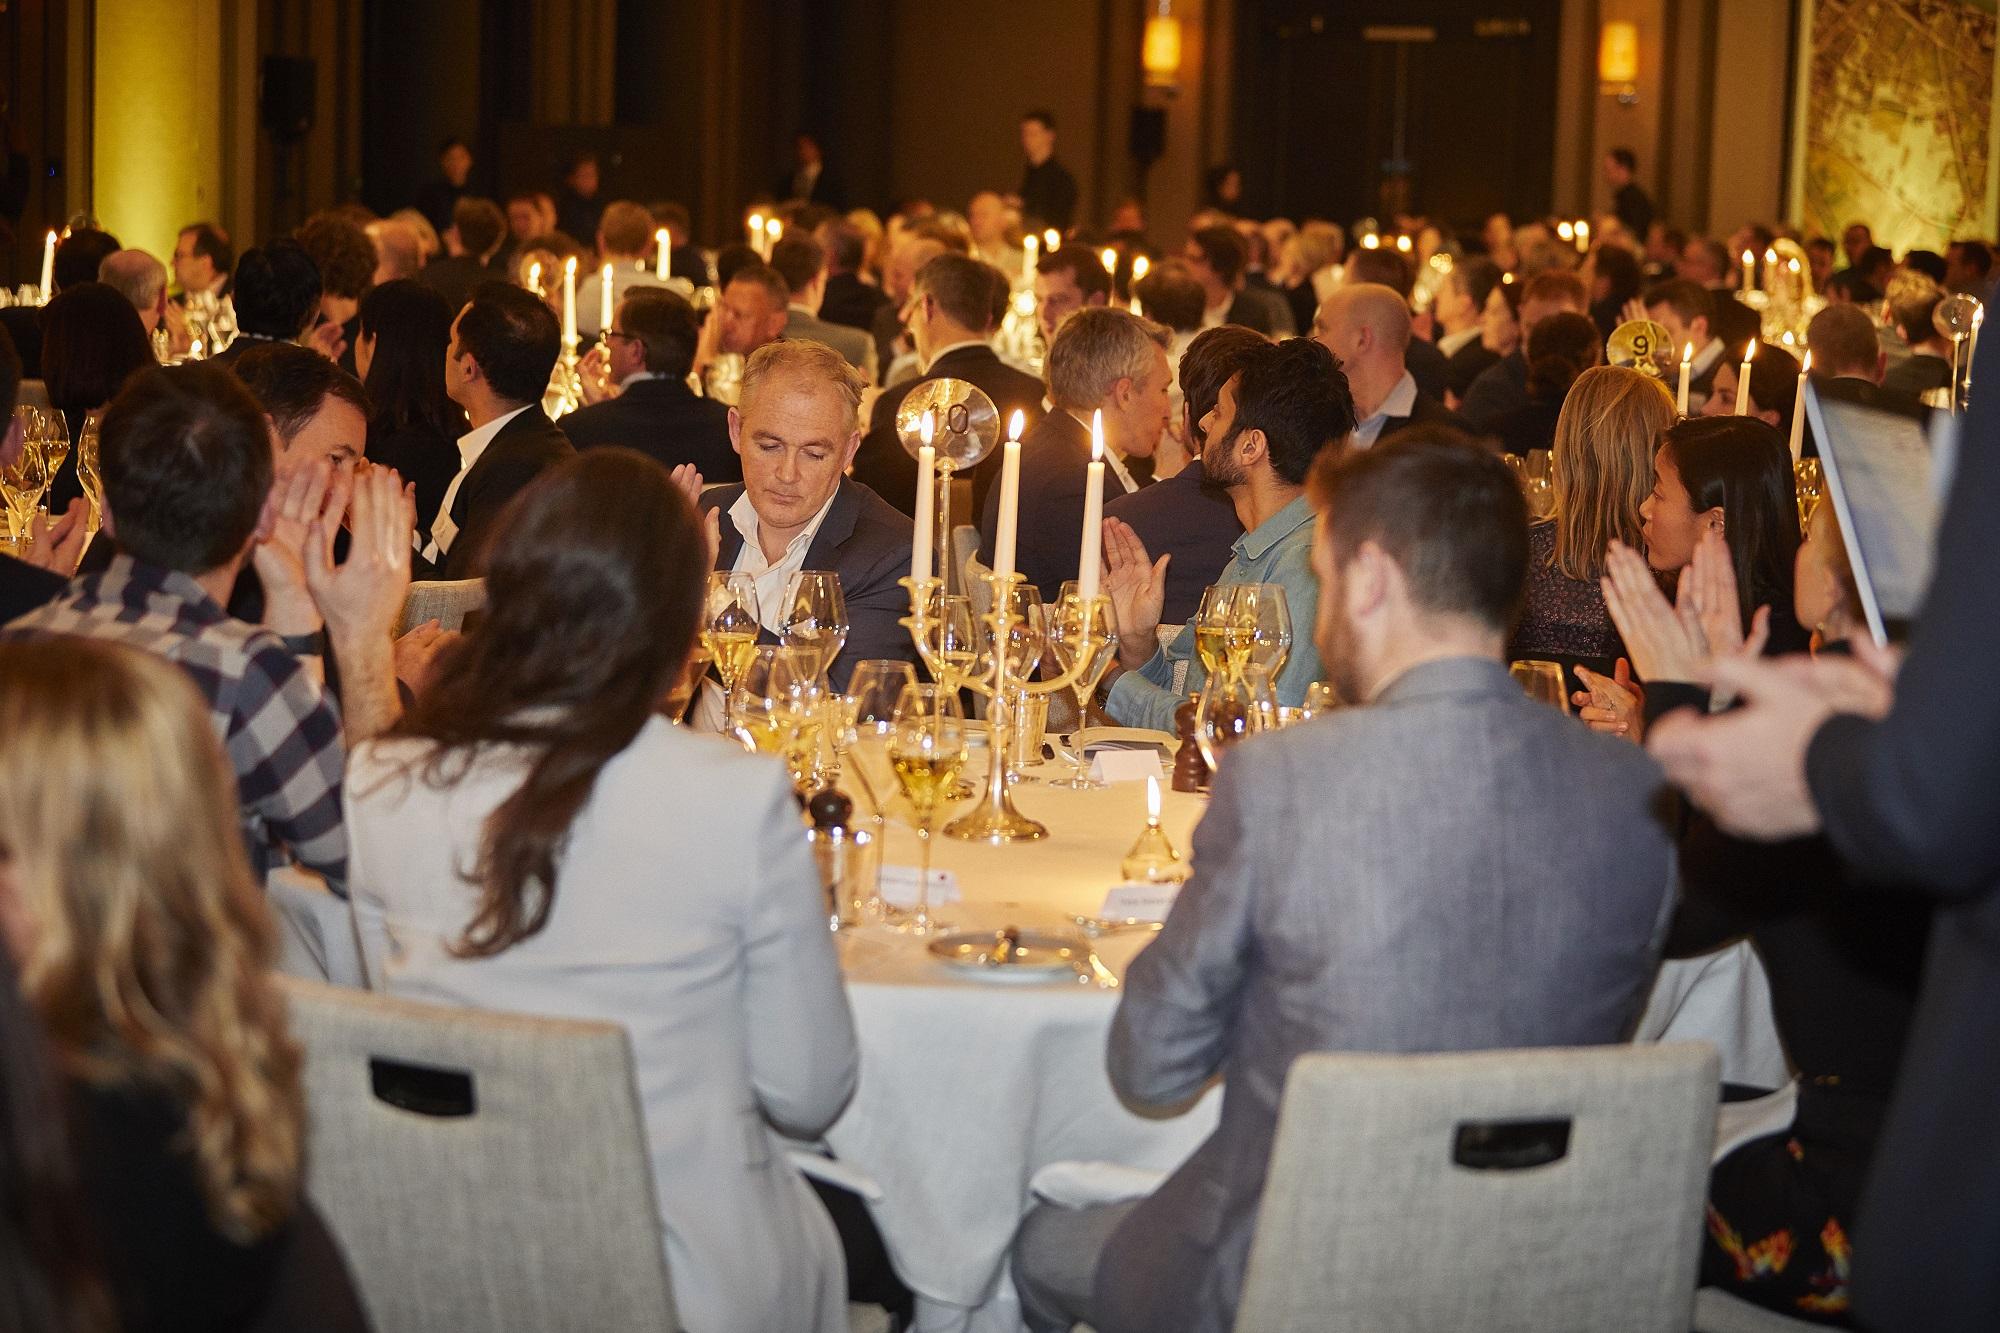 The-Up-Group-Digital-Masters-Board-Dinner-London-2019-11.jpg